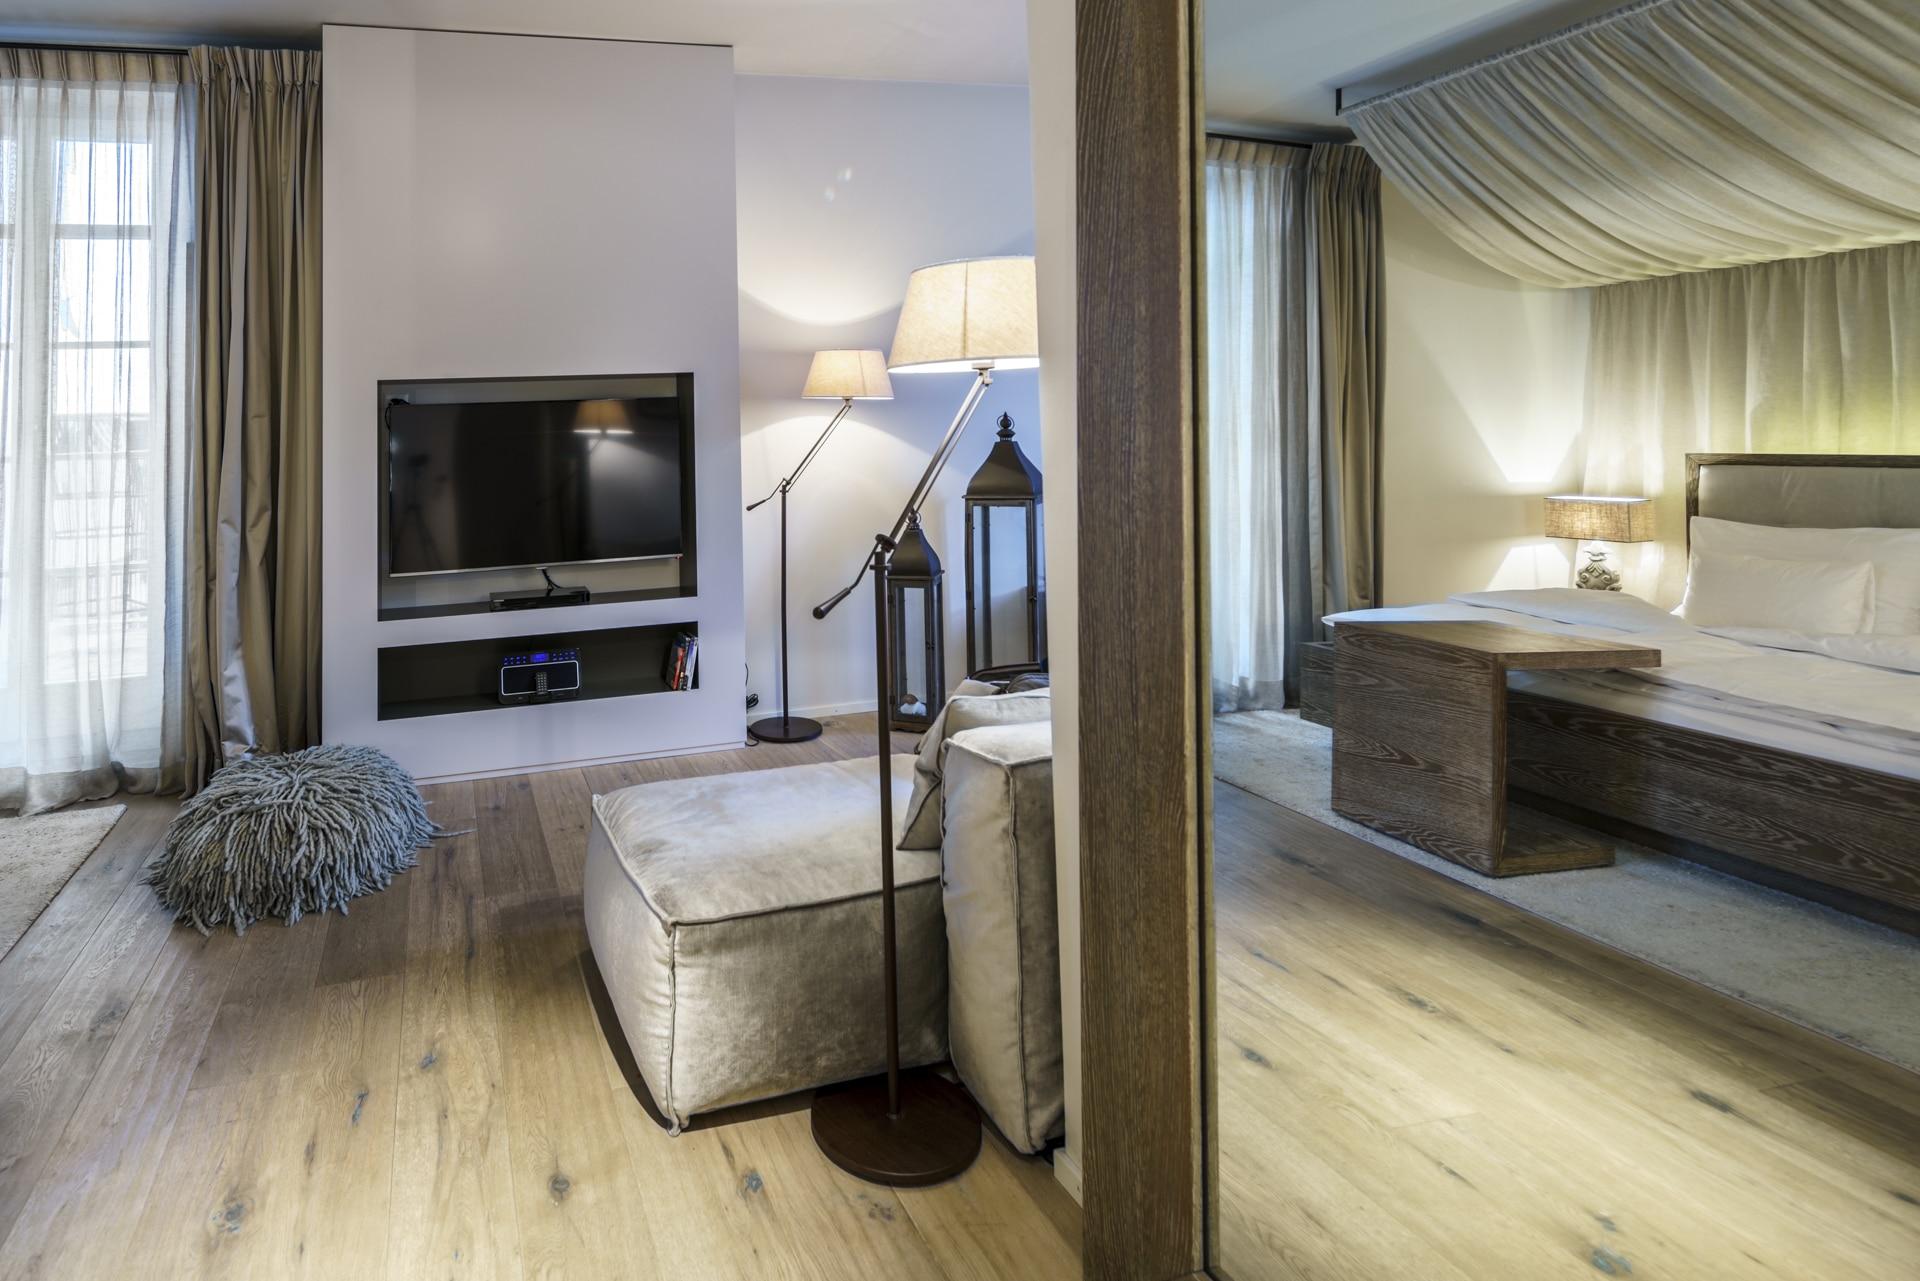 Premium Suite Charming Hotel Bad Bubendorf Ansicht 1